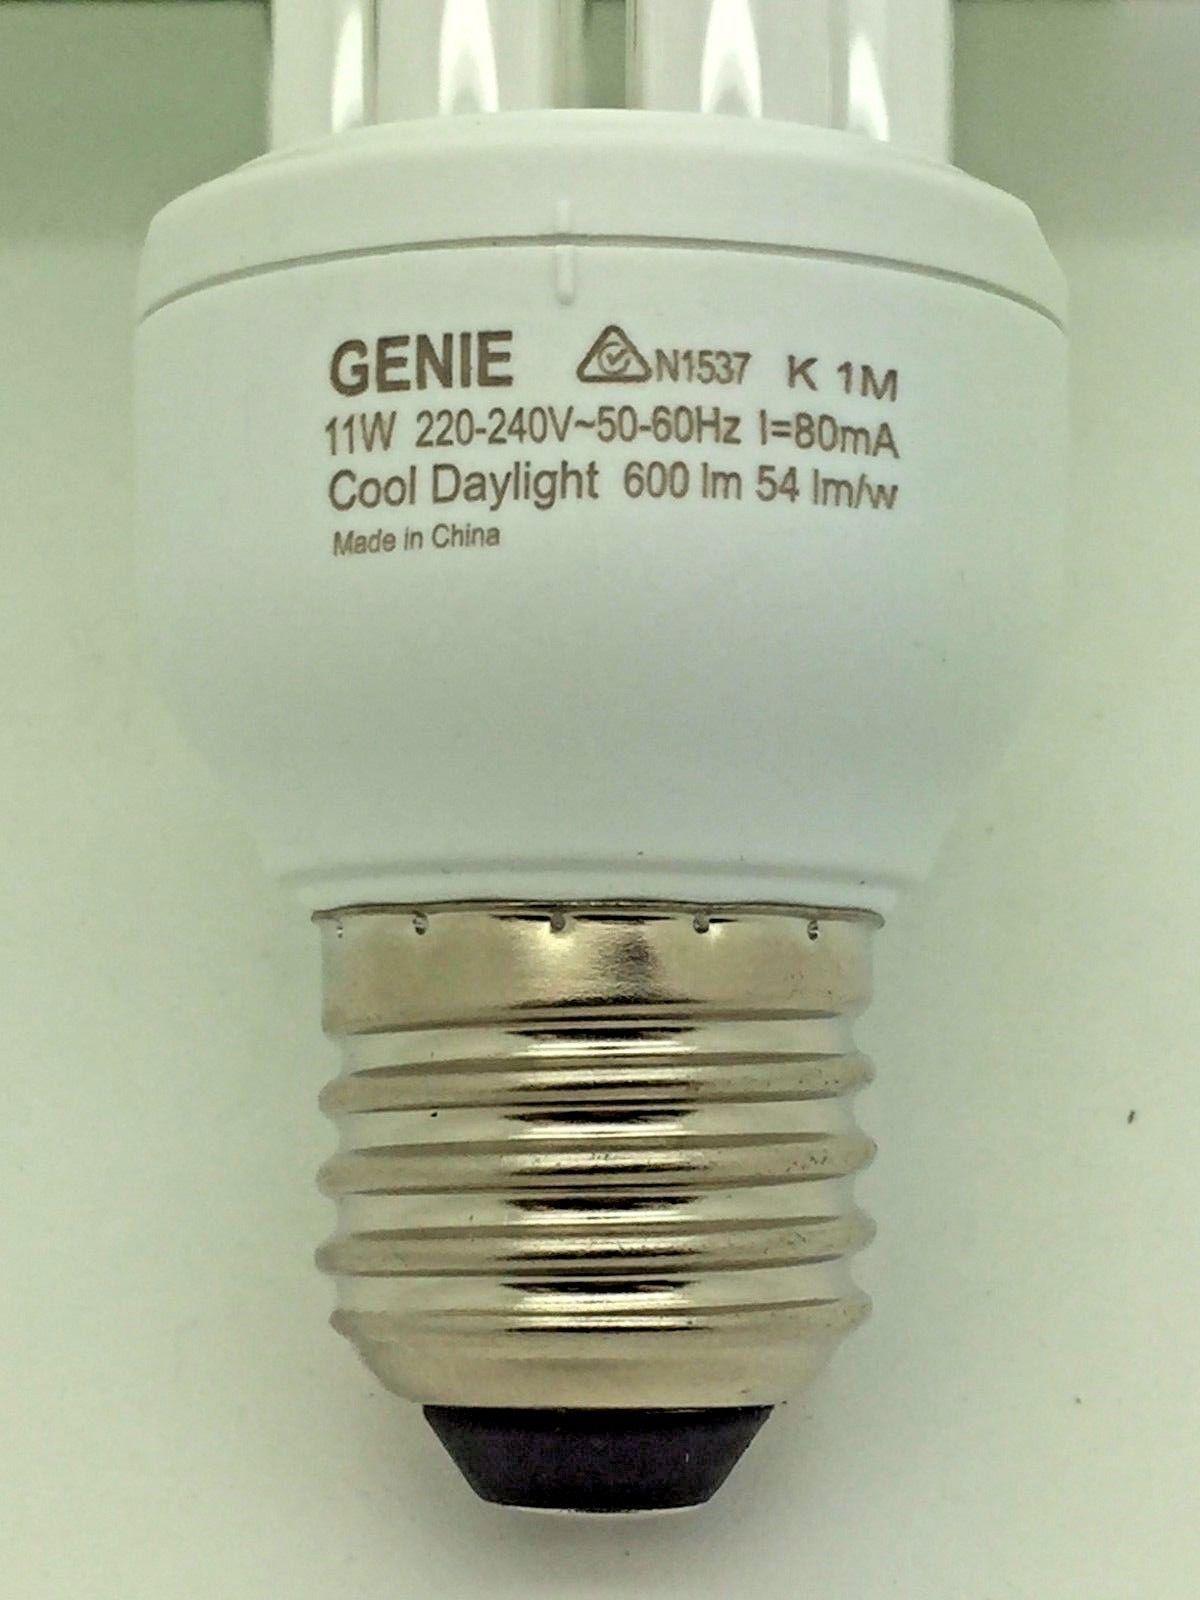 Philips Genie Lamp 11w 220 240v Cool Daylight 80 Energy Saver E27 Flc X 6 8710163228952 Ebay Energy Saver Genie Lamp Philips